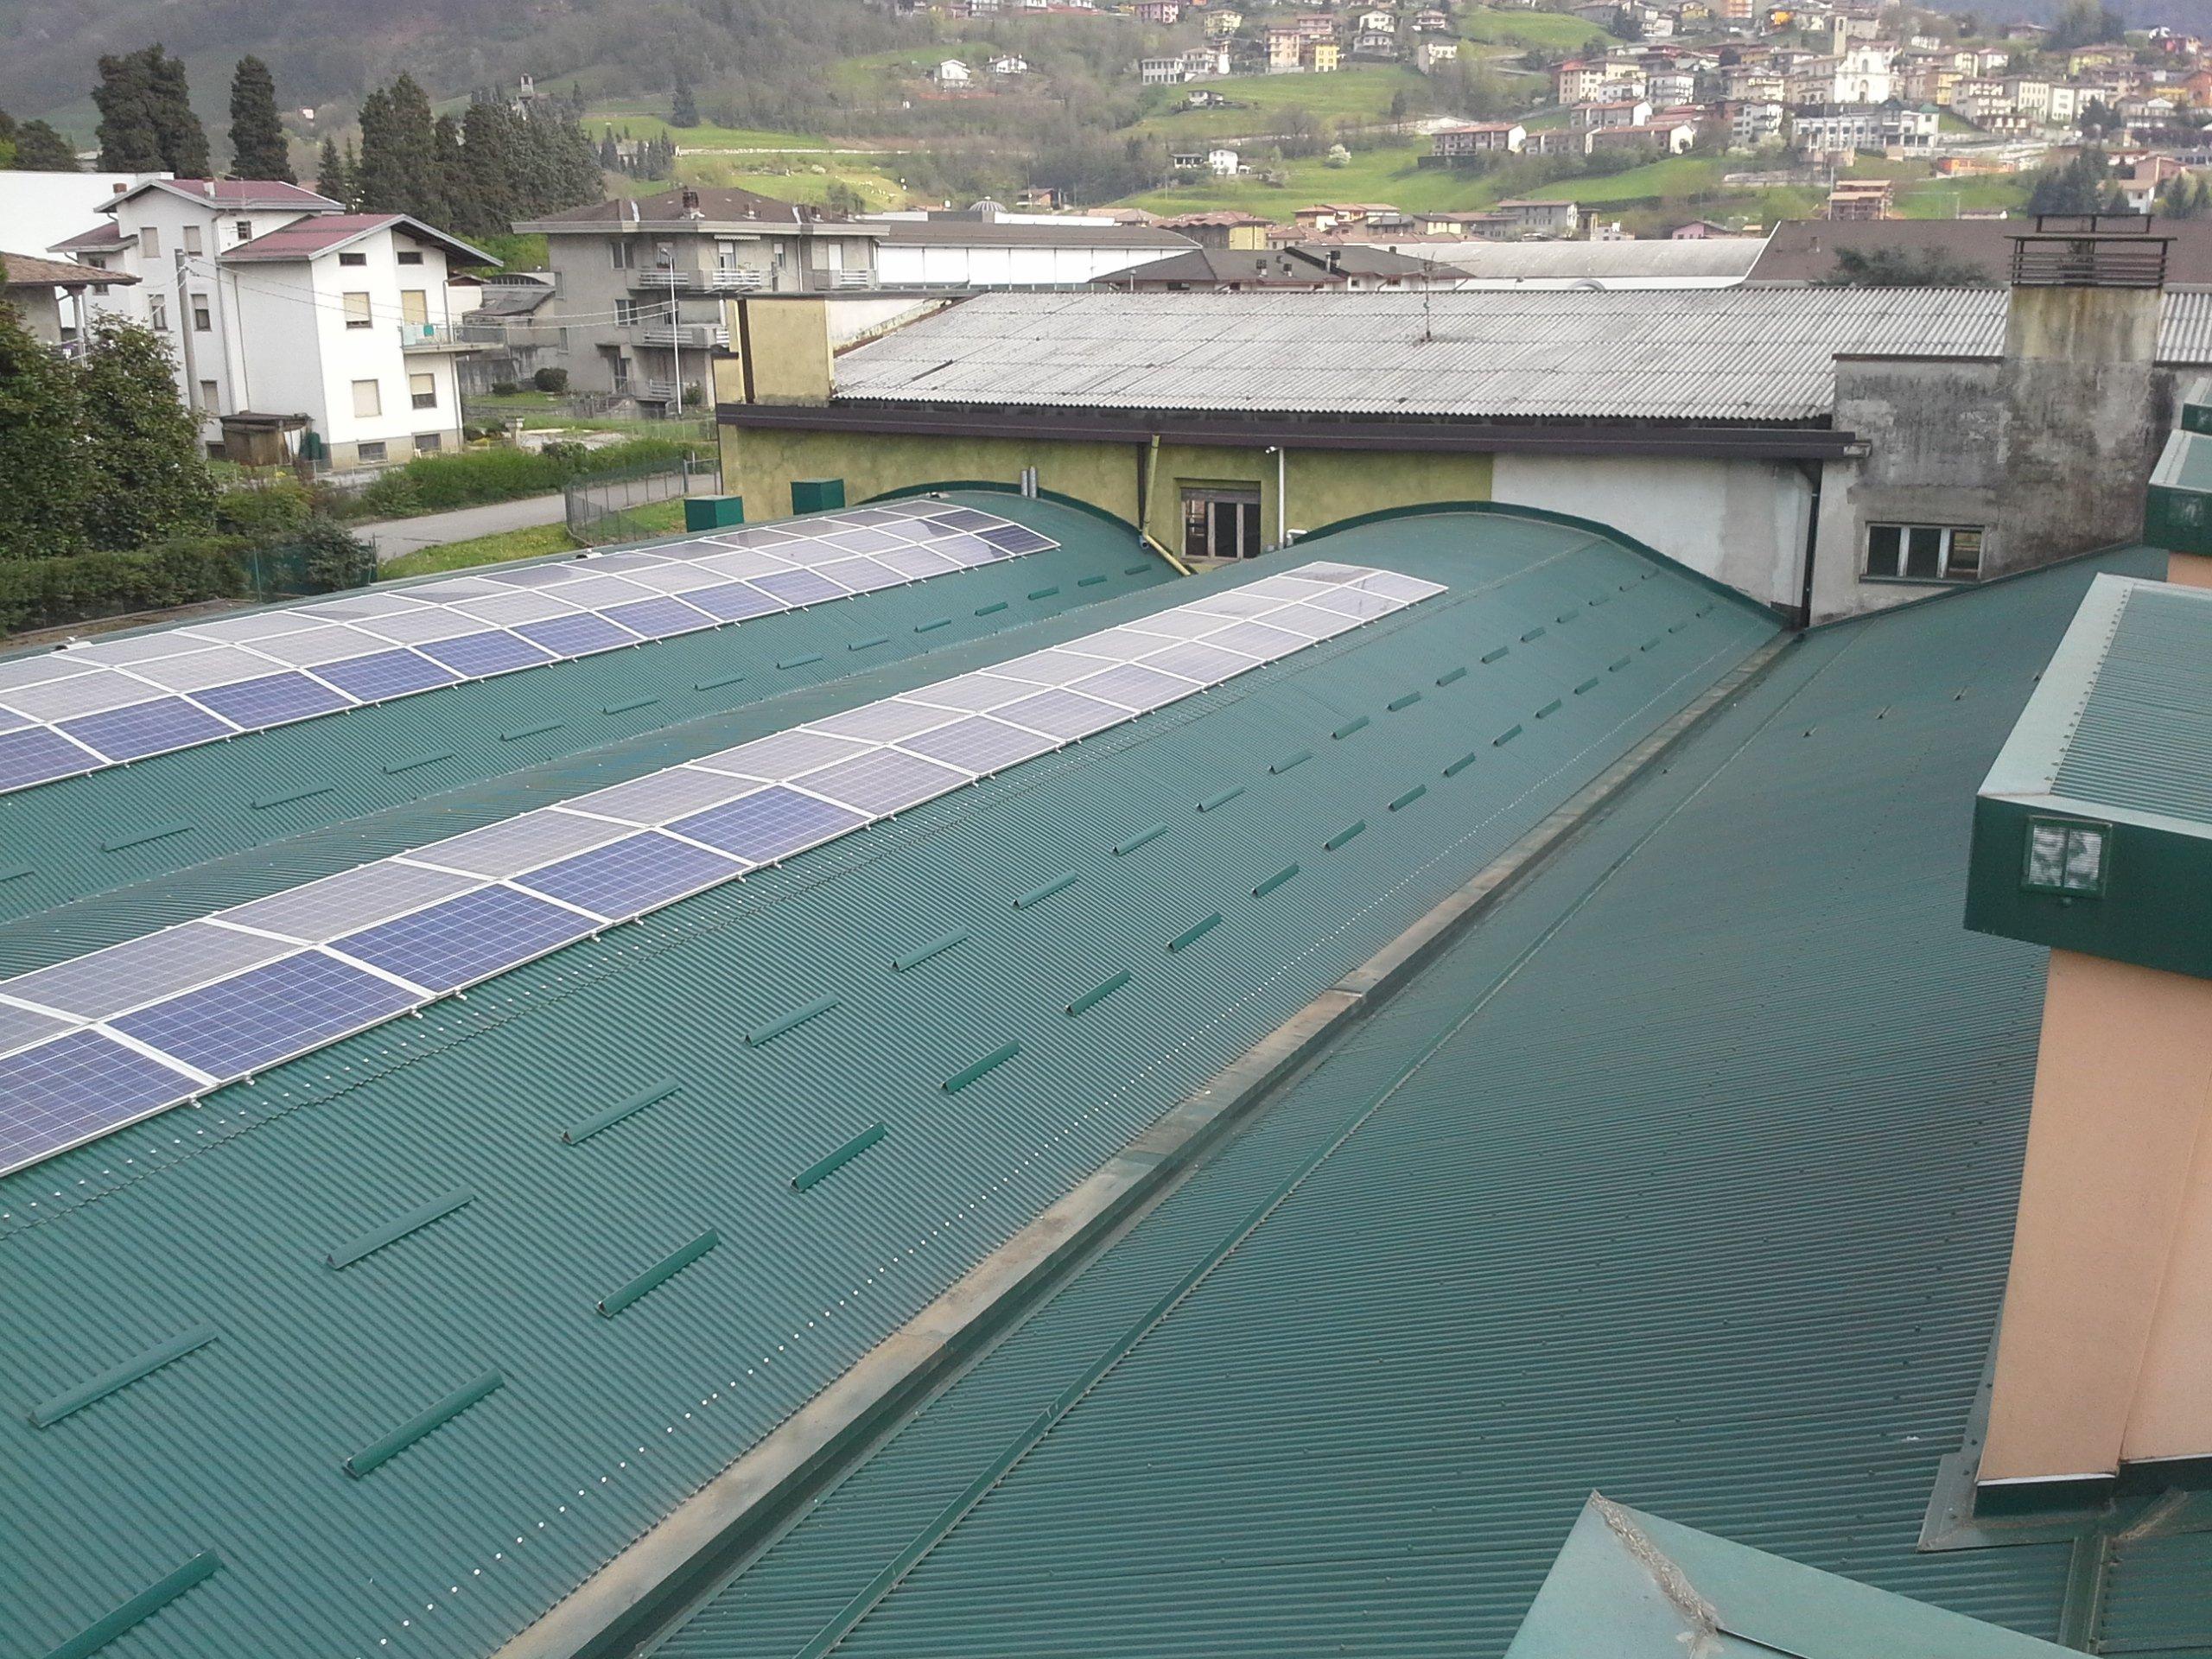 tetto industriale verde con lucernari